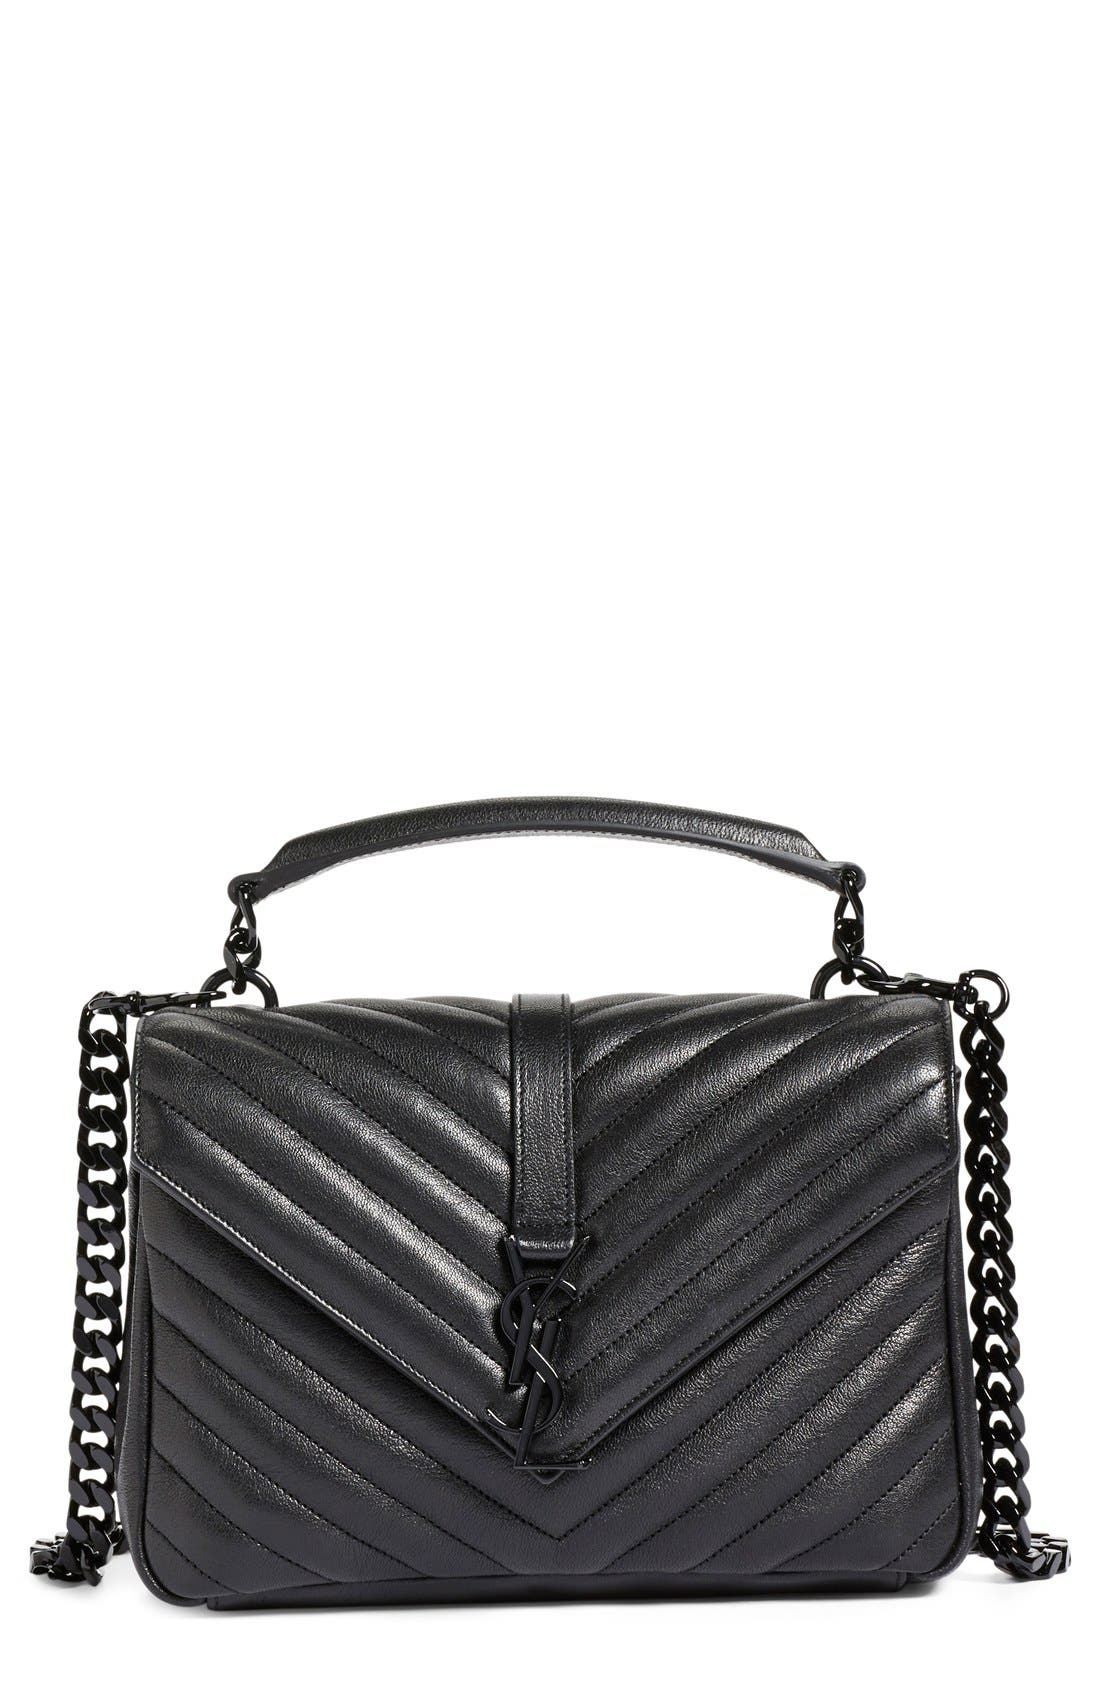 'Medium College' Quilted Leather Shoulder Bag, Main, color, 001